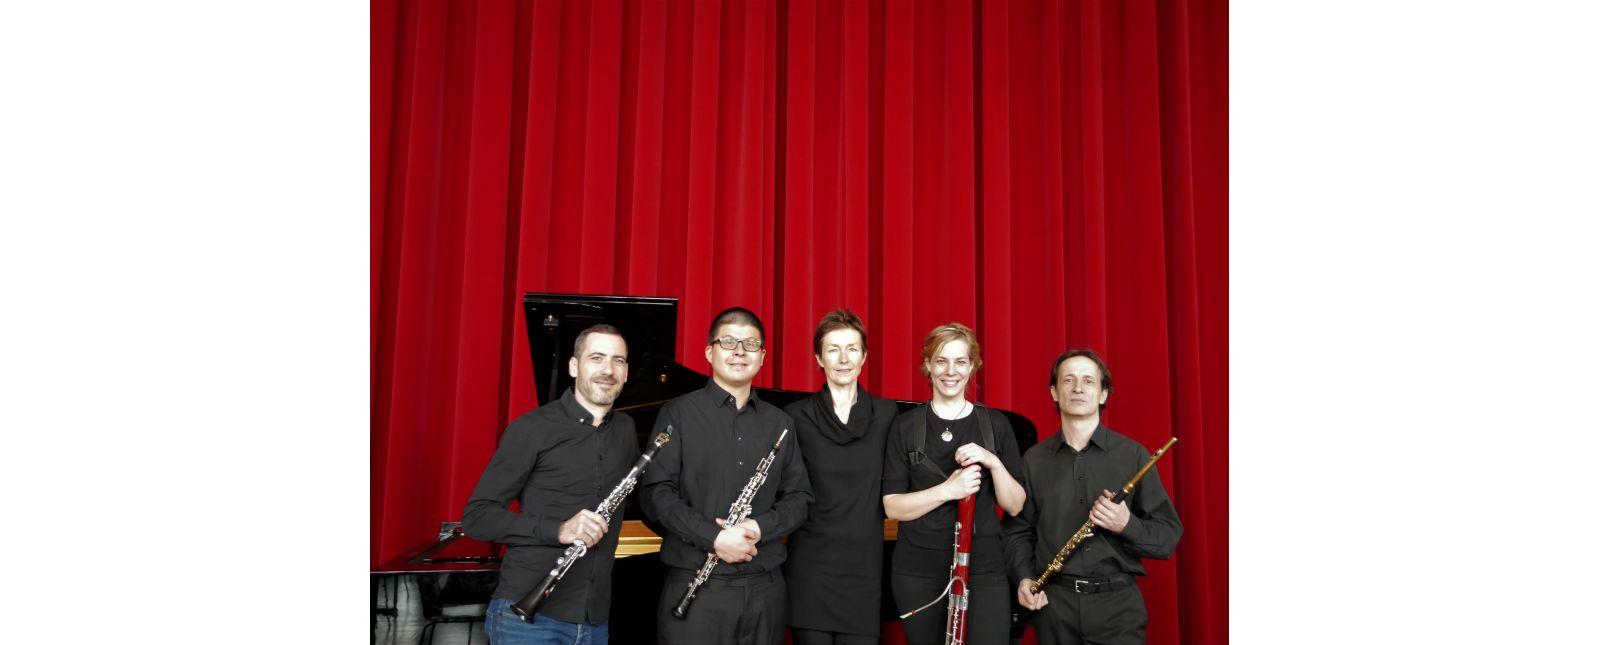 Ensemble 5. Kammerkonzert // Julien Laffaire // Luis Teo // Katharina Kegler // Susanne Keck // Daniel Lampert // 2019 // Foto: Theater Freiburg